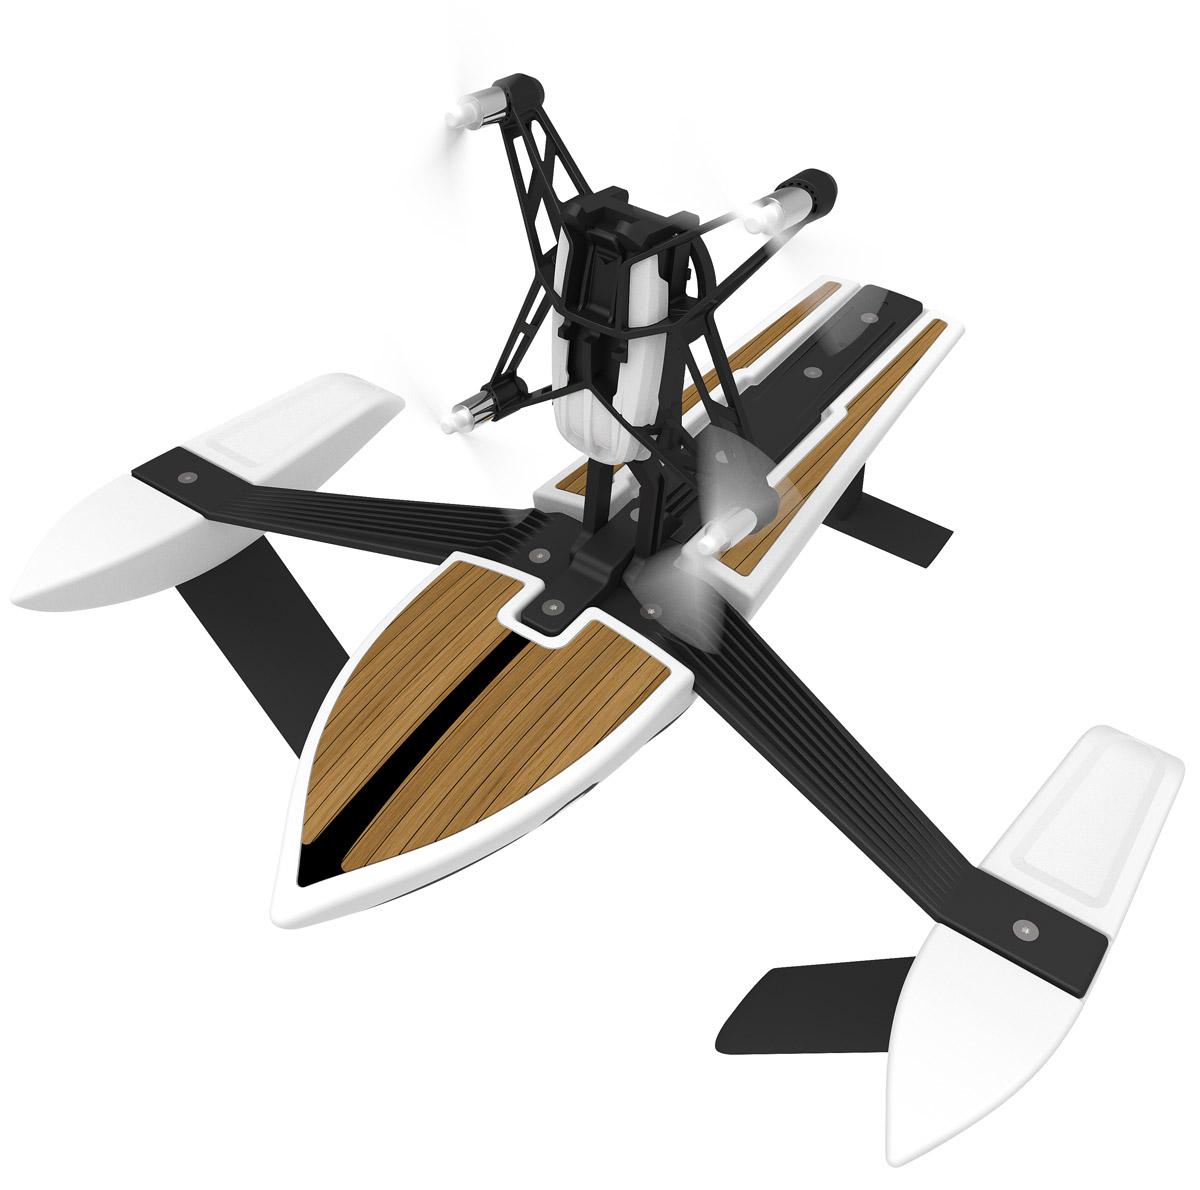 Parrot Квадрокоптер на радиоуправлении Minidrone Hydrofoil NewZ и корабль Hydrofoil